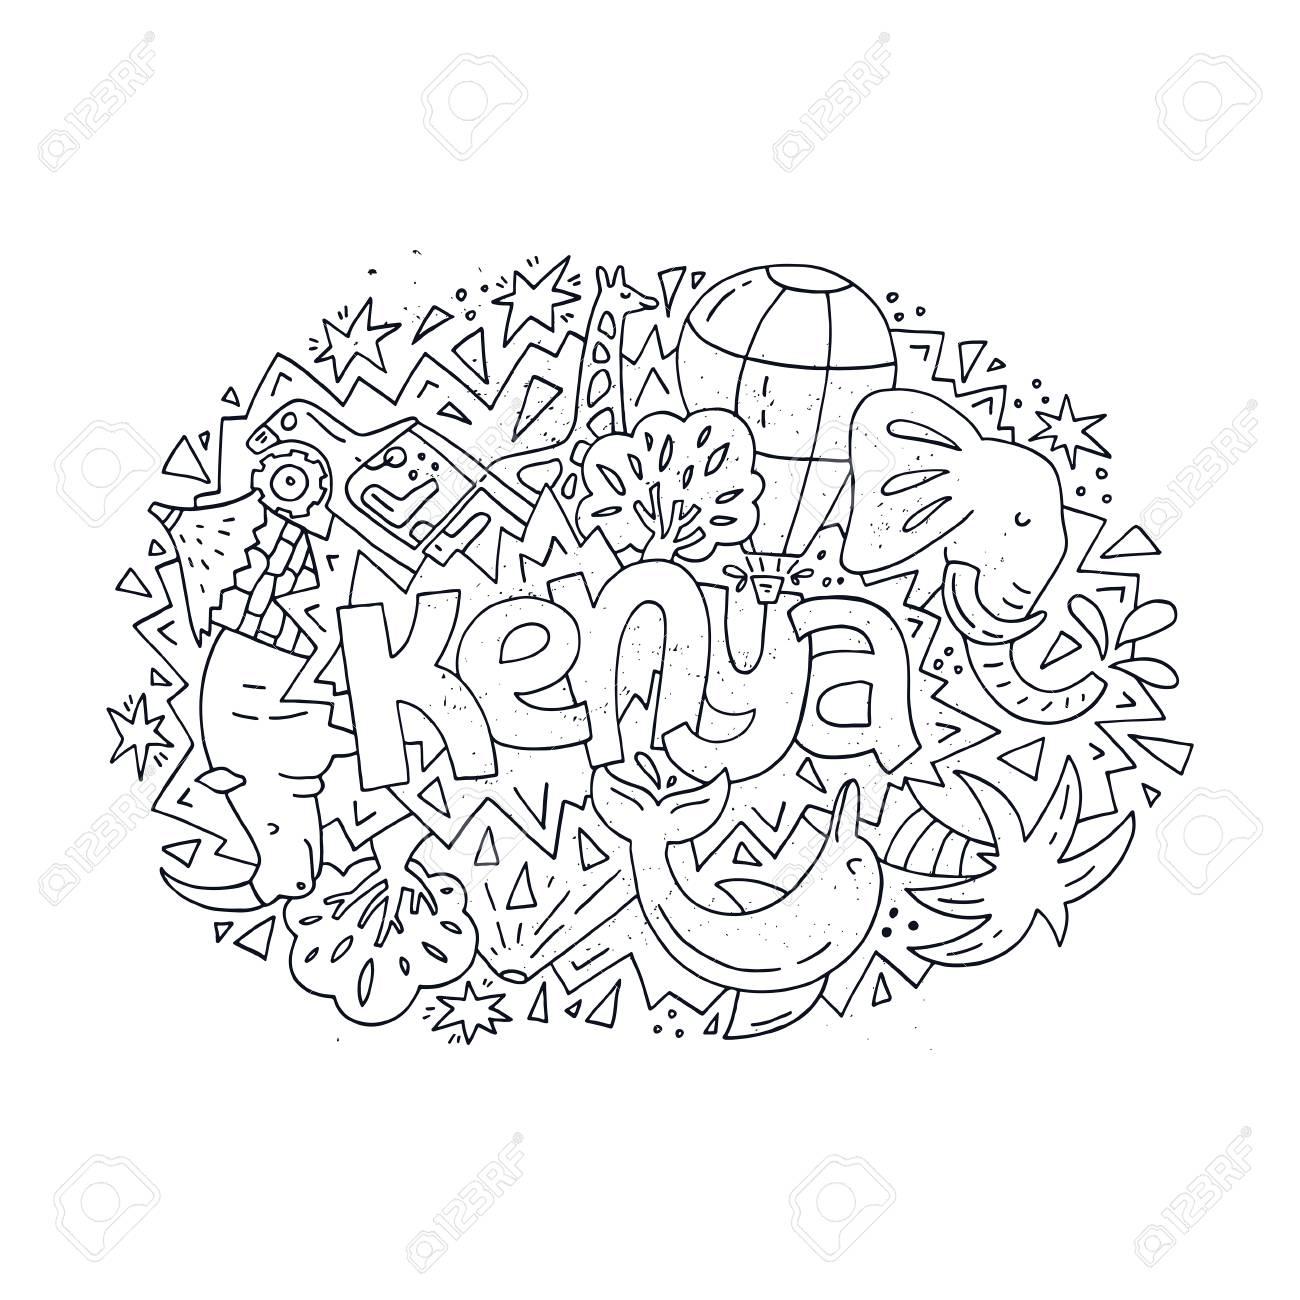 Ilustración De Kenia Para Colorear Para Niños O Adultos. Concepto ...